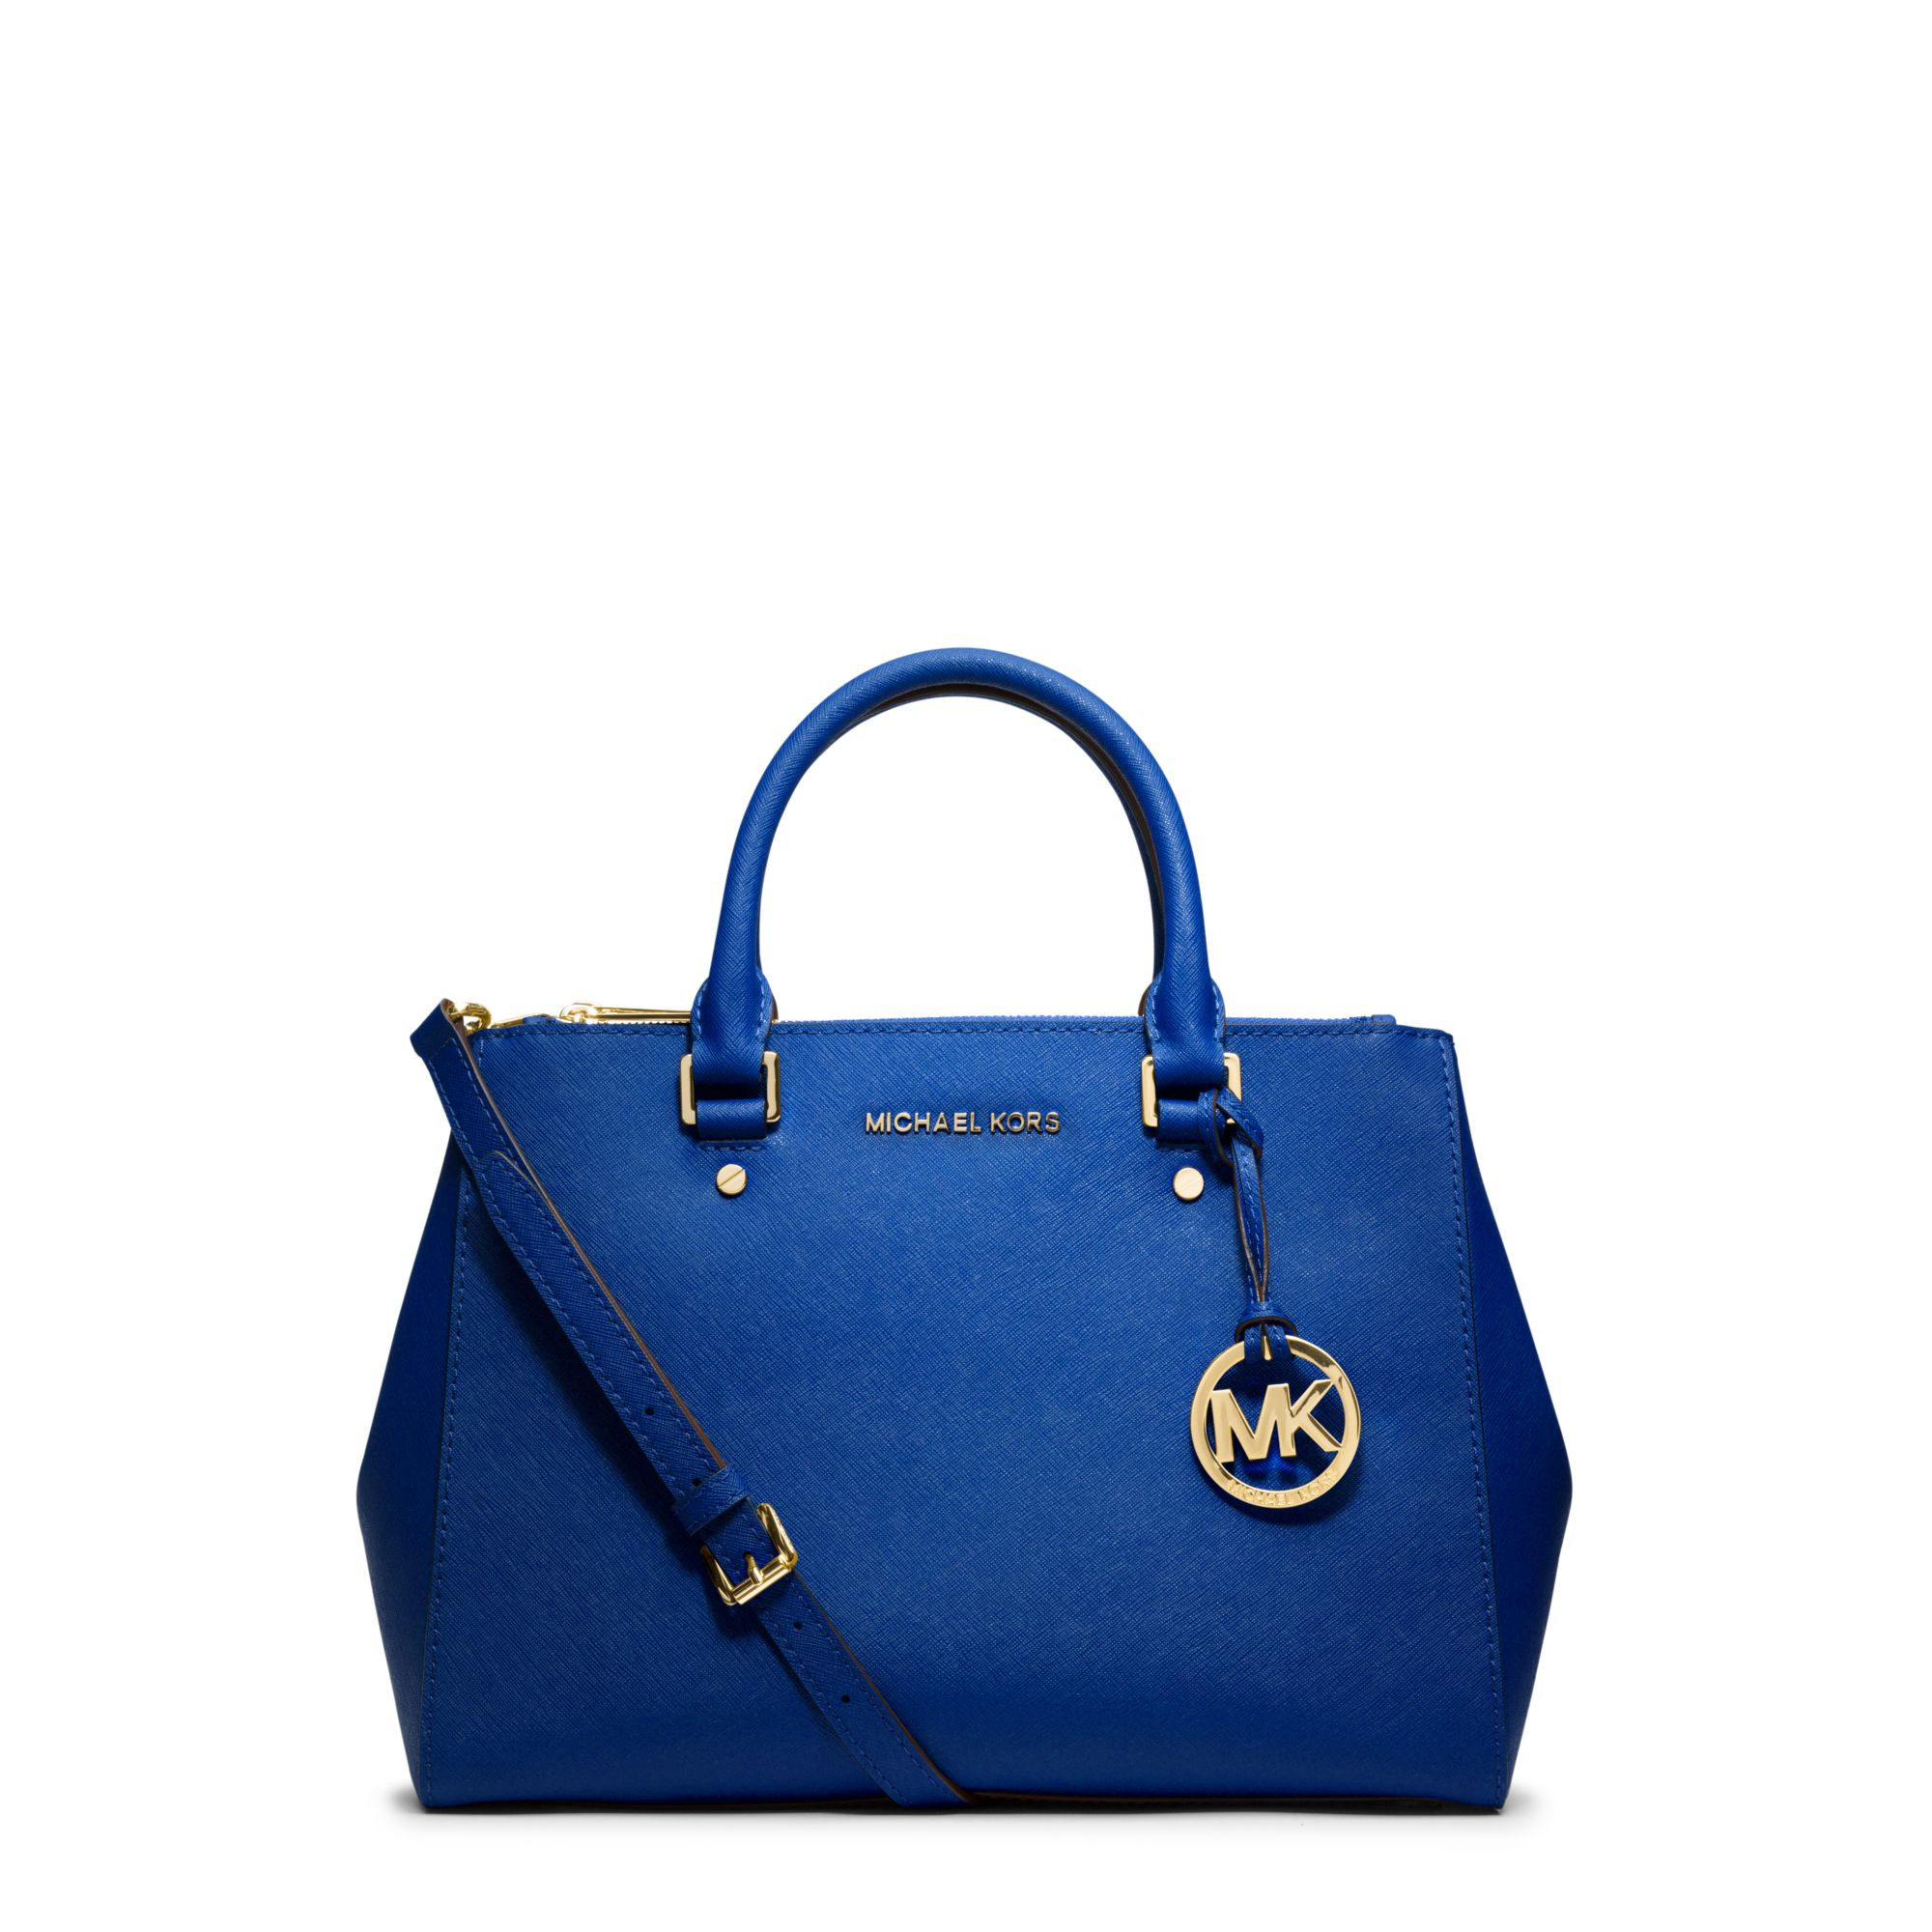 Case Design micheal kors phone cases Michael kors Sutton Medium Saffiano Leather Satchel in Blue : Lyst